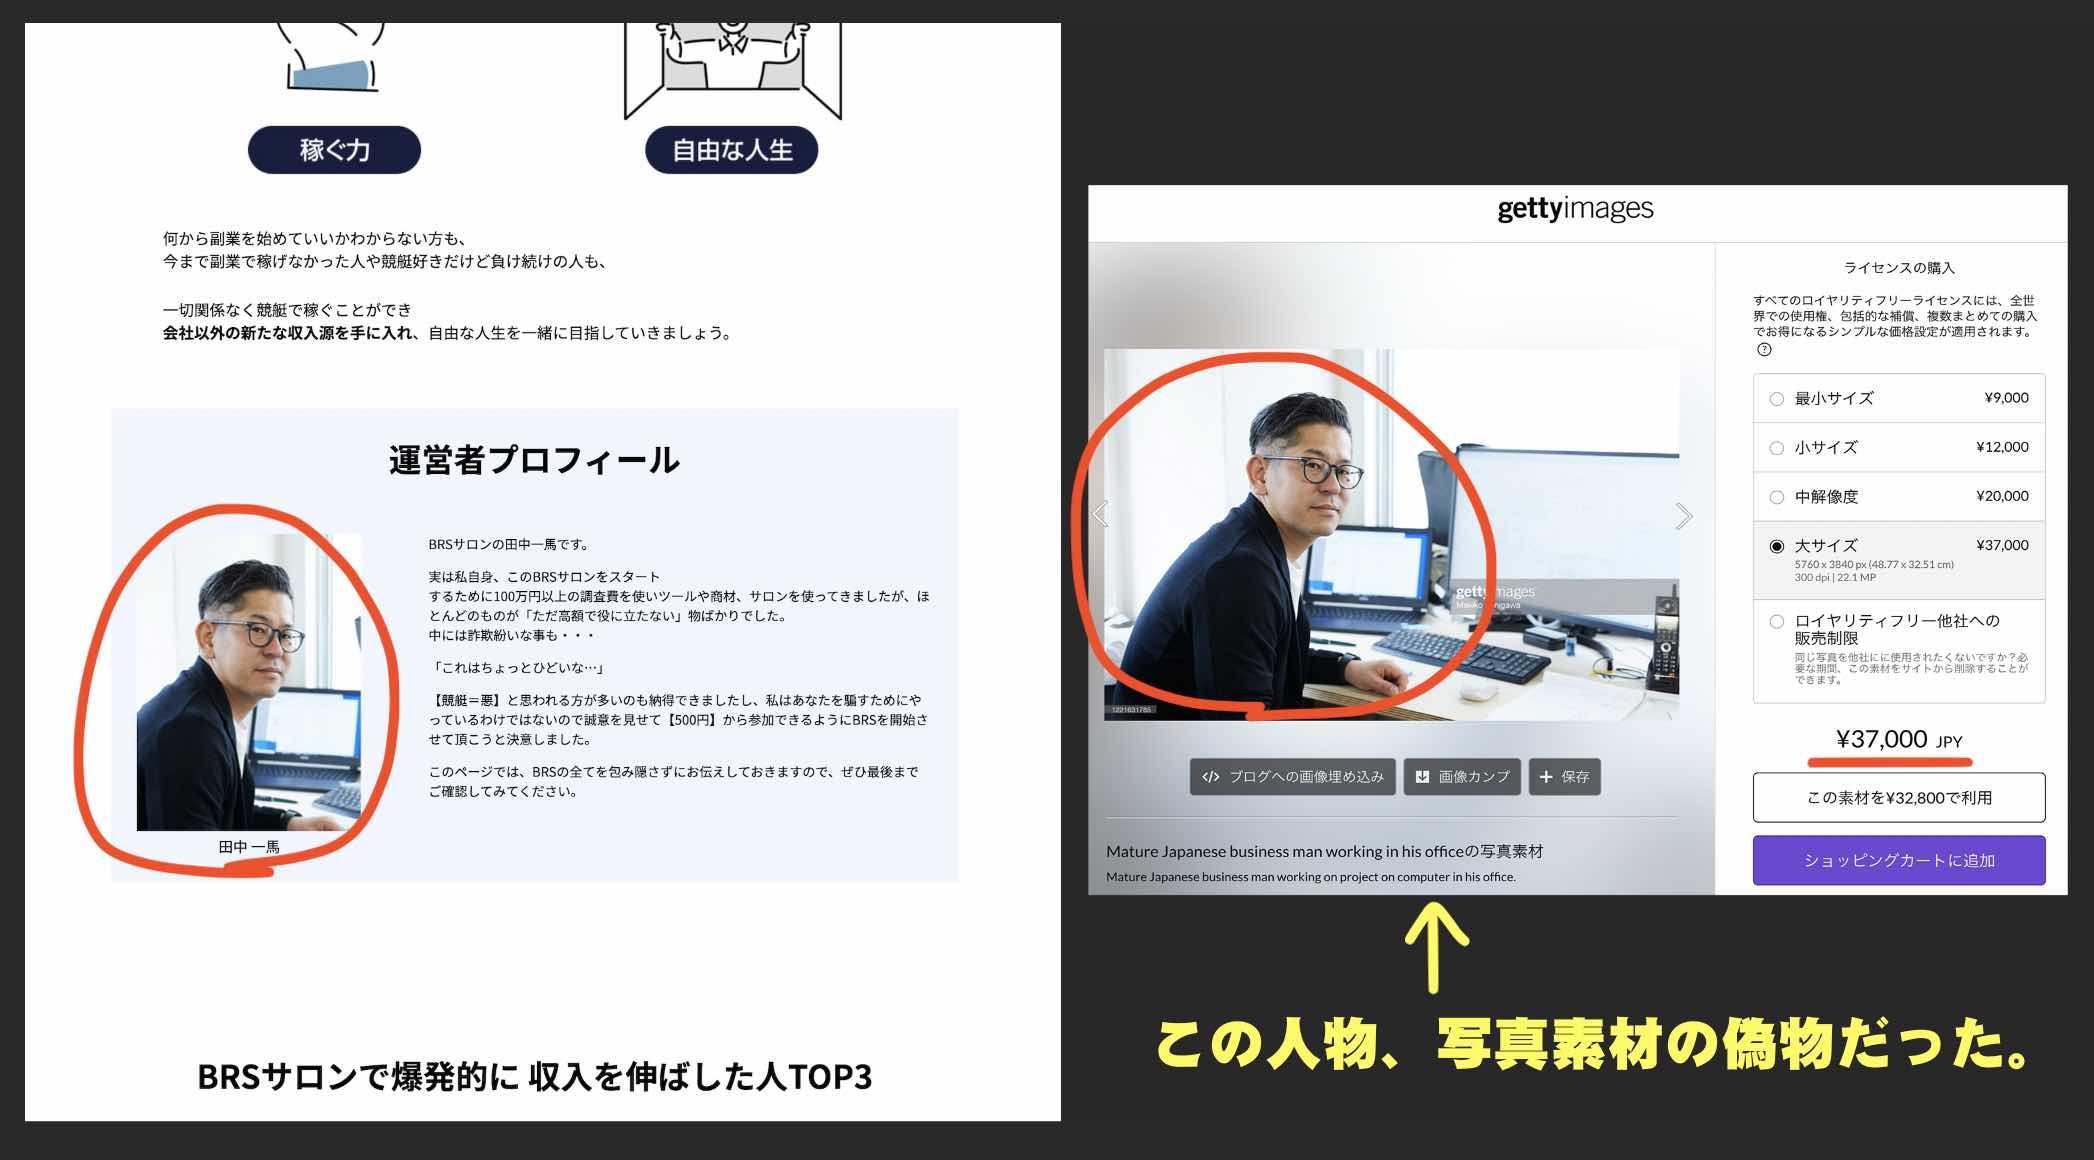 BRSサロン(ボートレースサロン)という競艇予想サイトの運営者、田中一馬は偽物